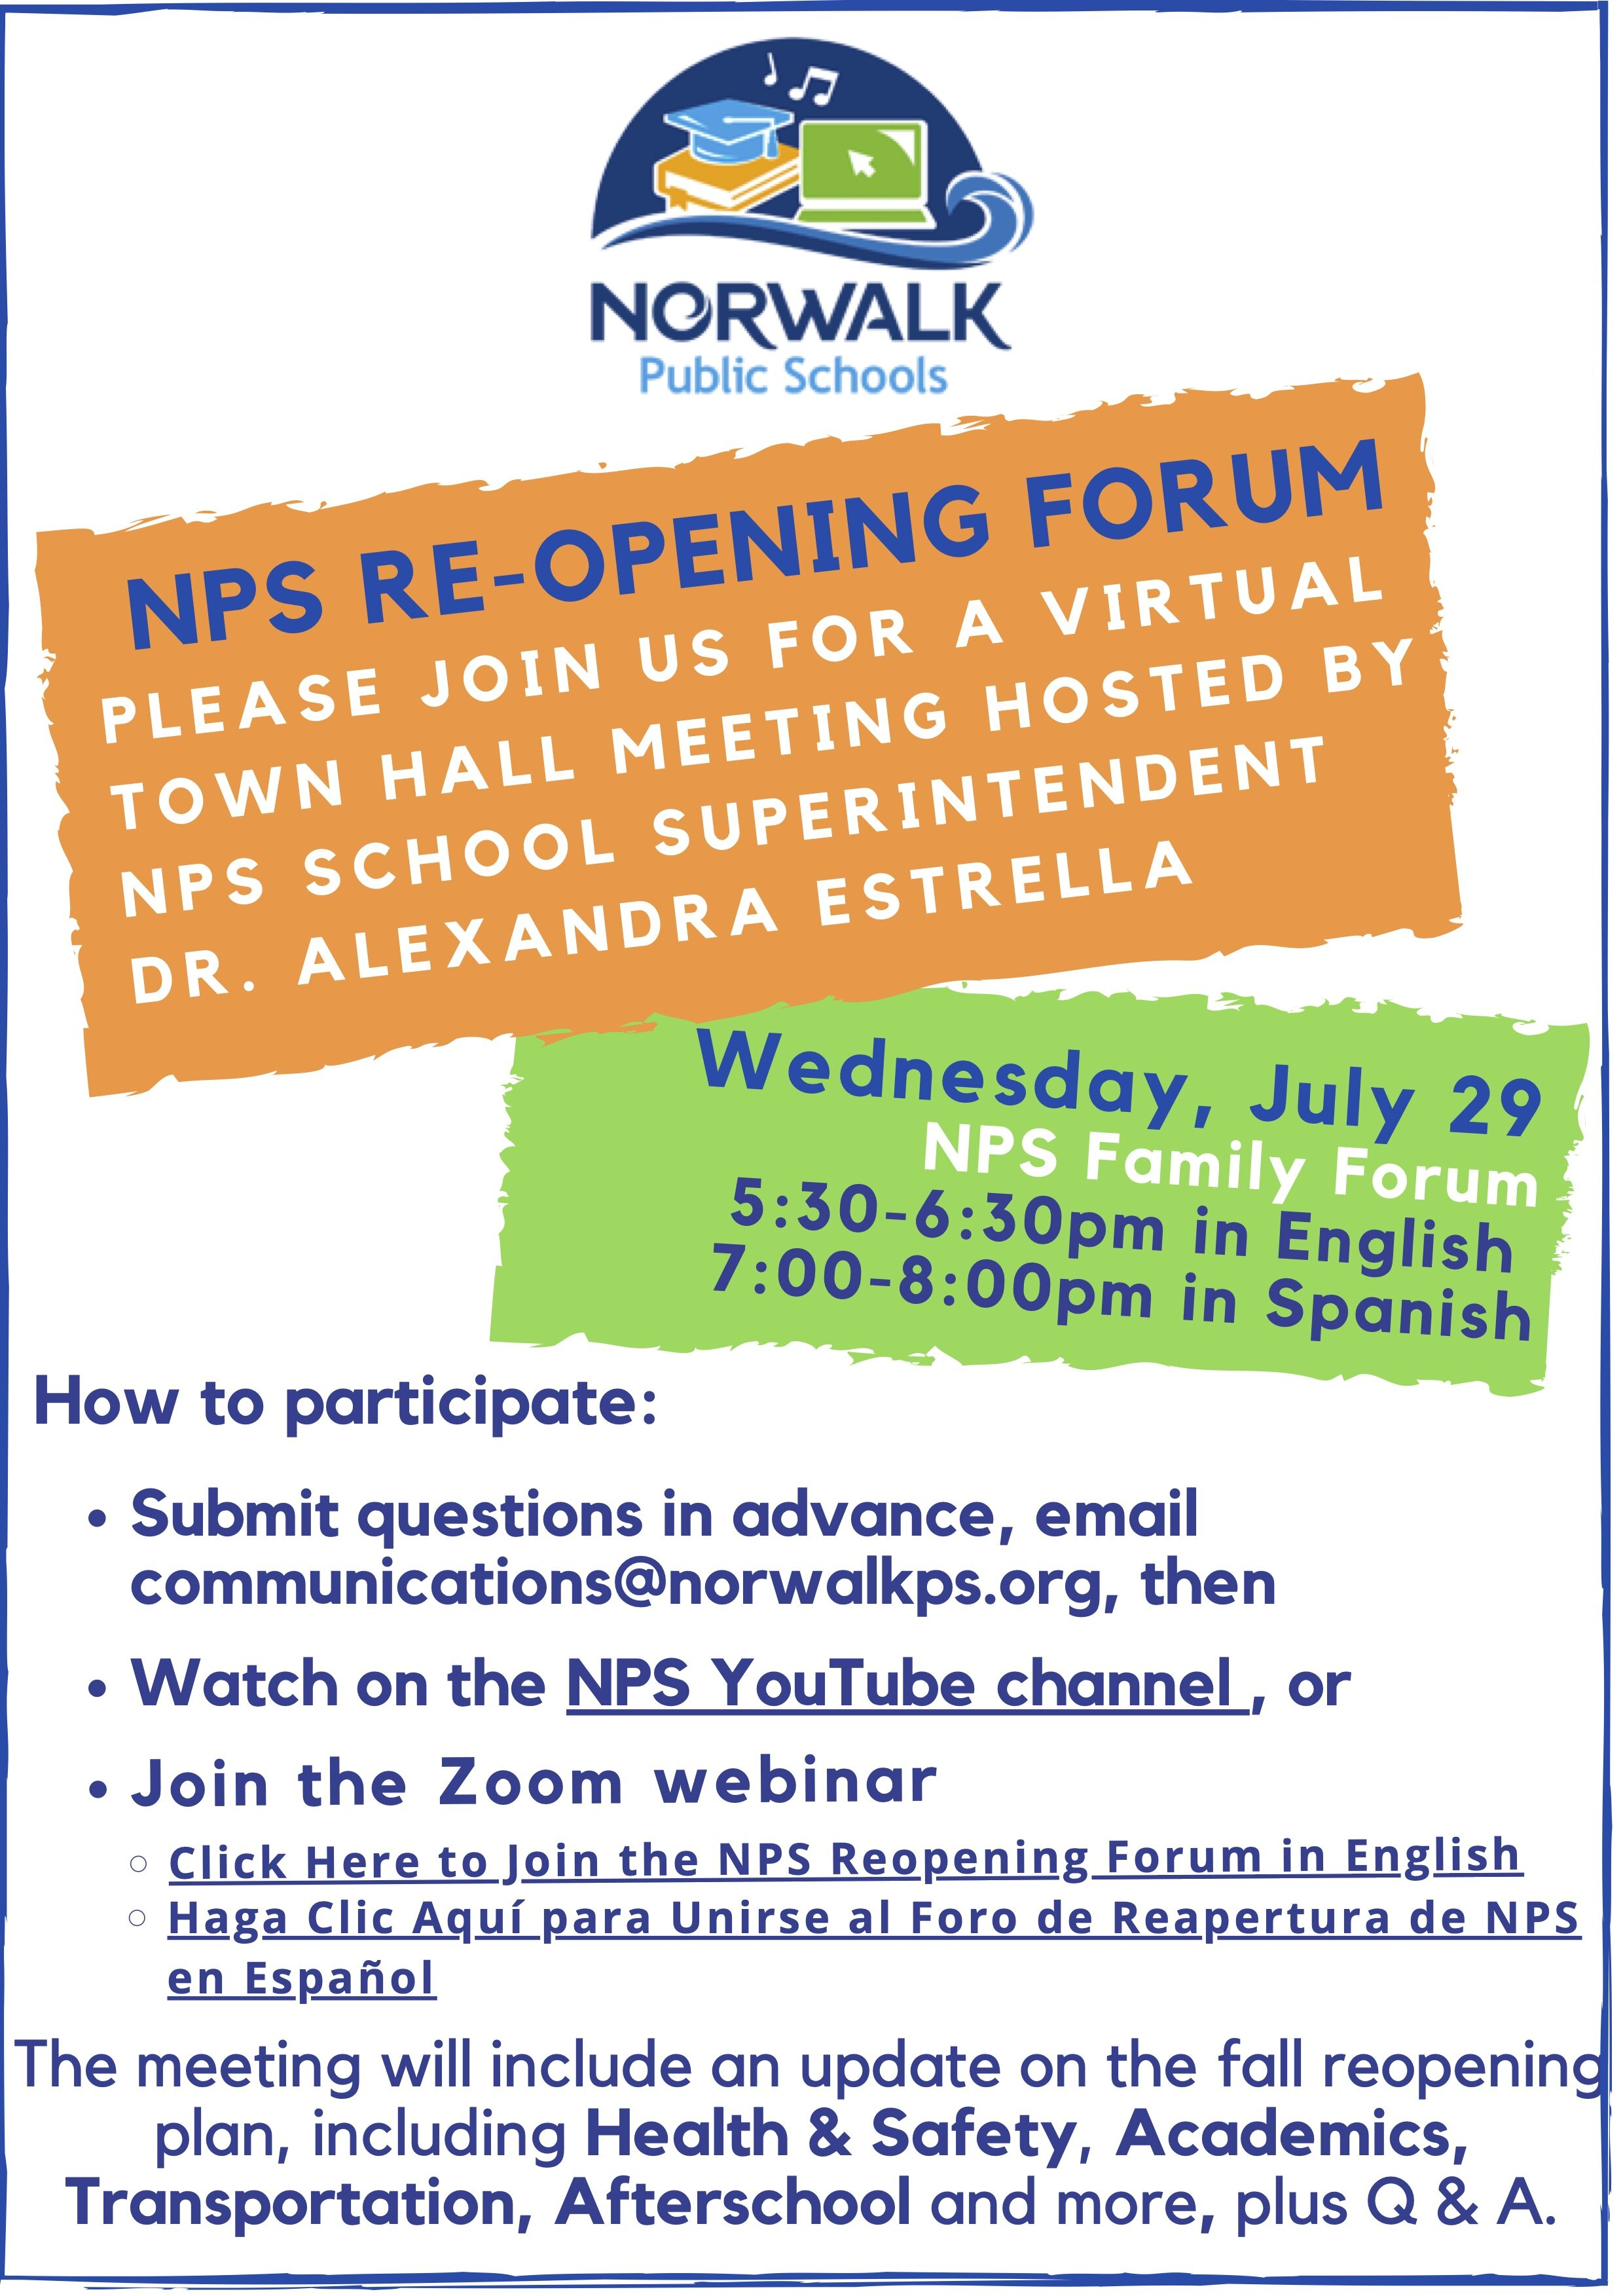 Nps Reopening Plans Forum Carver Foundation Of Norwalk